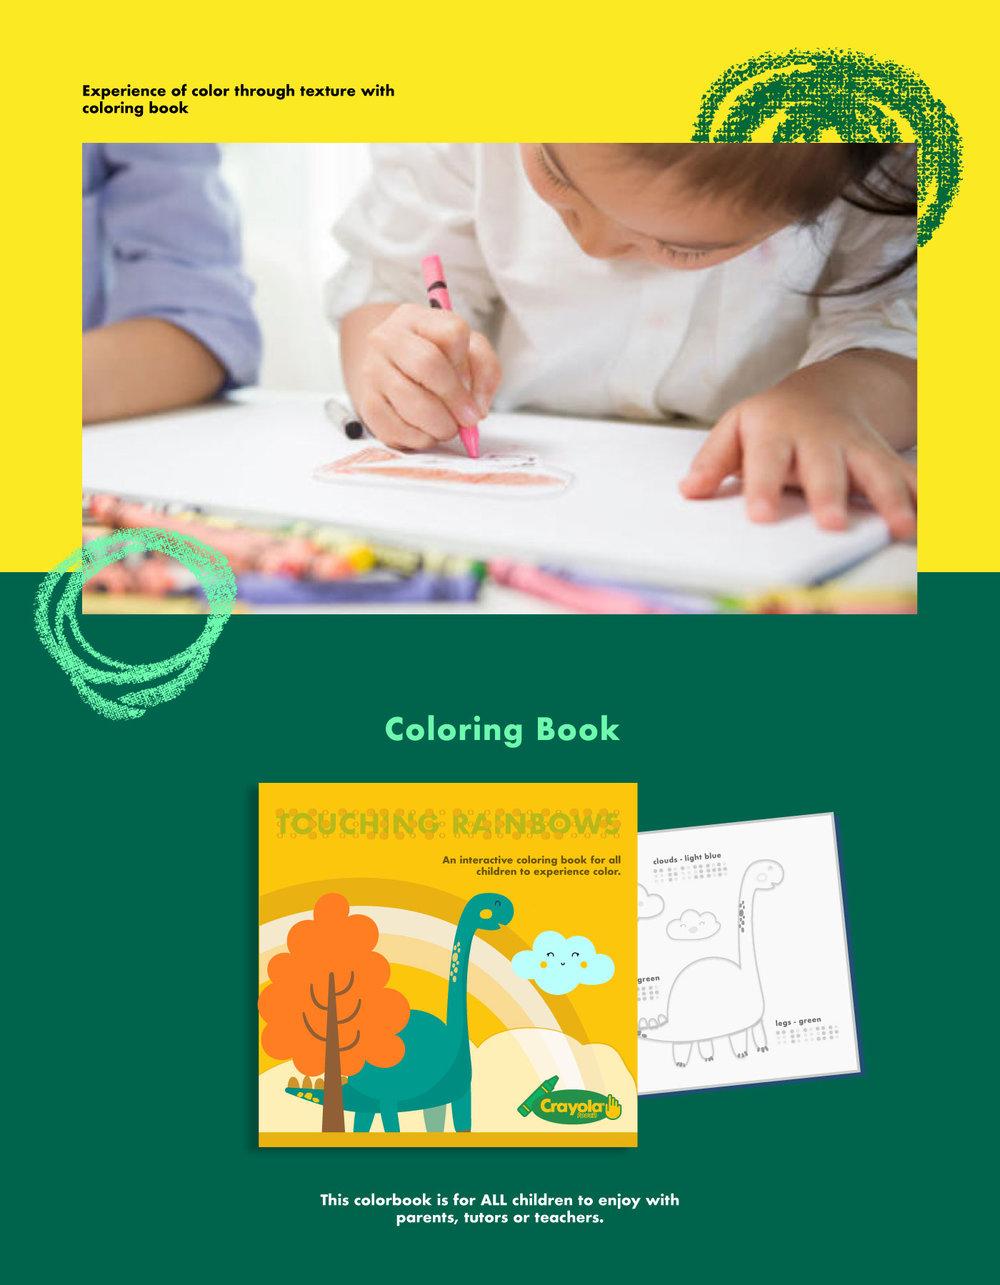 Crayola-Behance-7.jpg